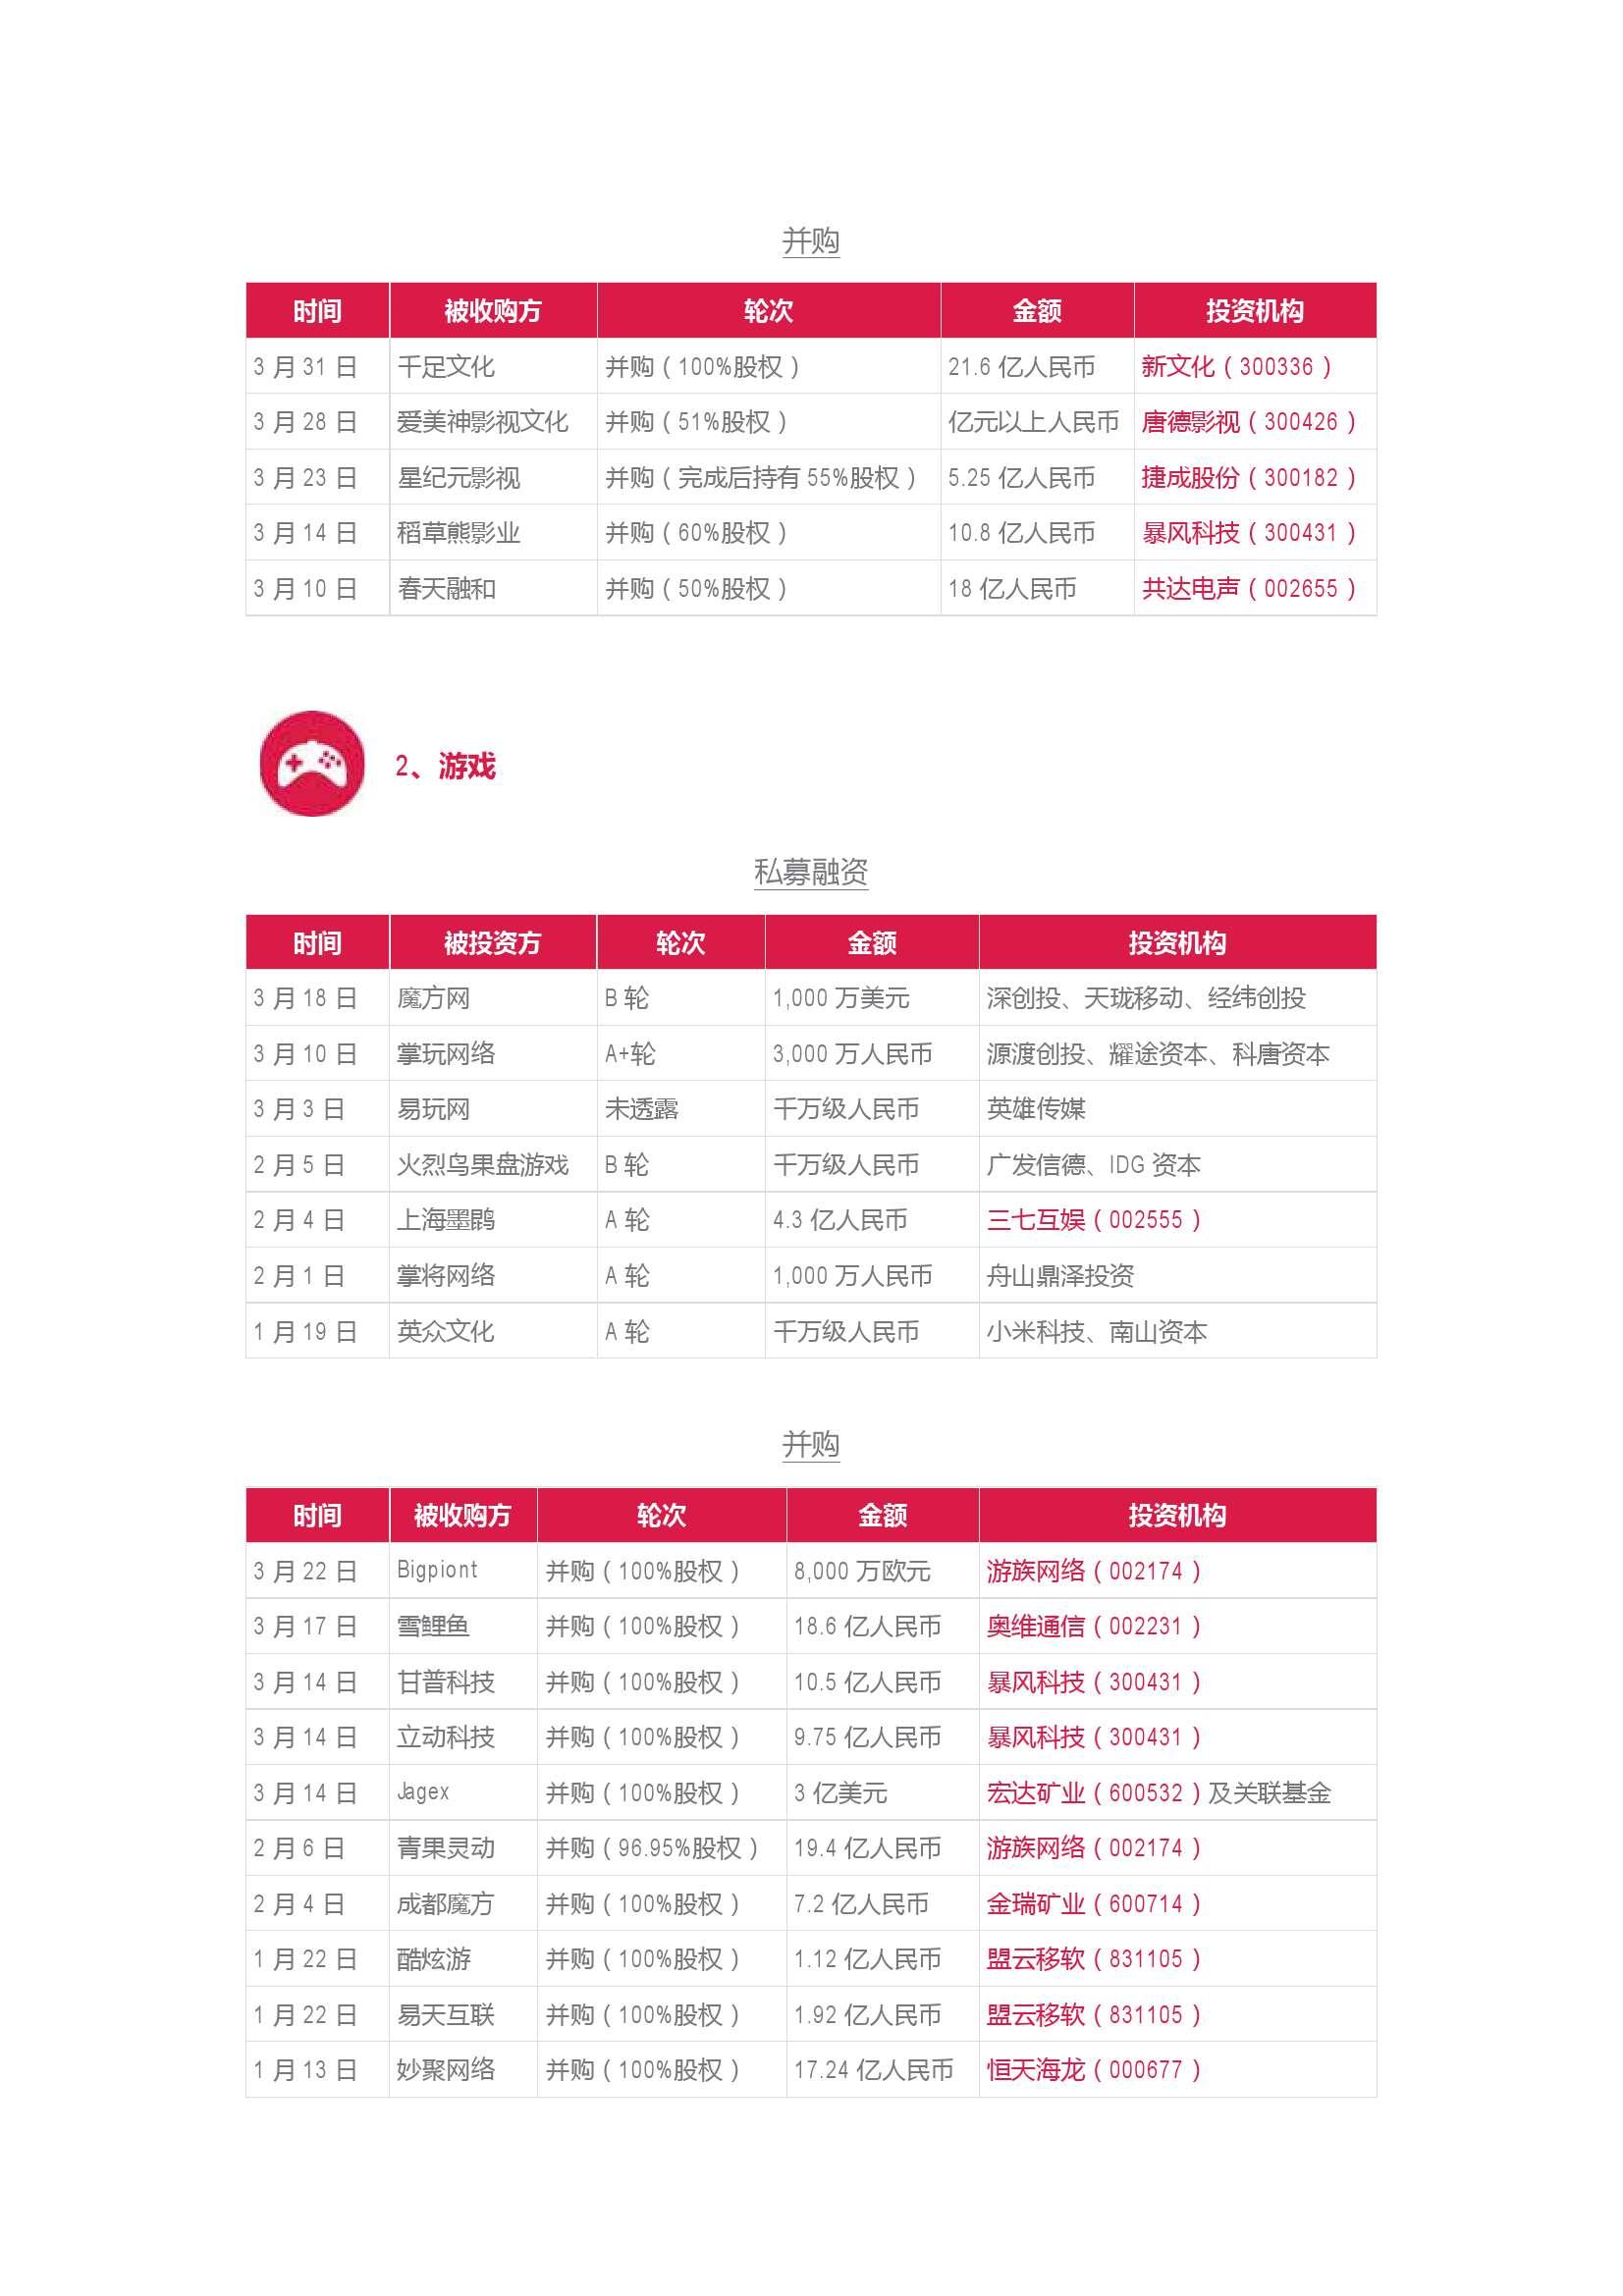 2016Q1中国娱乐产业季度观察_000011